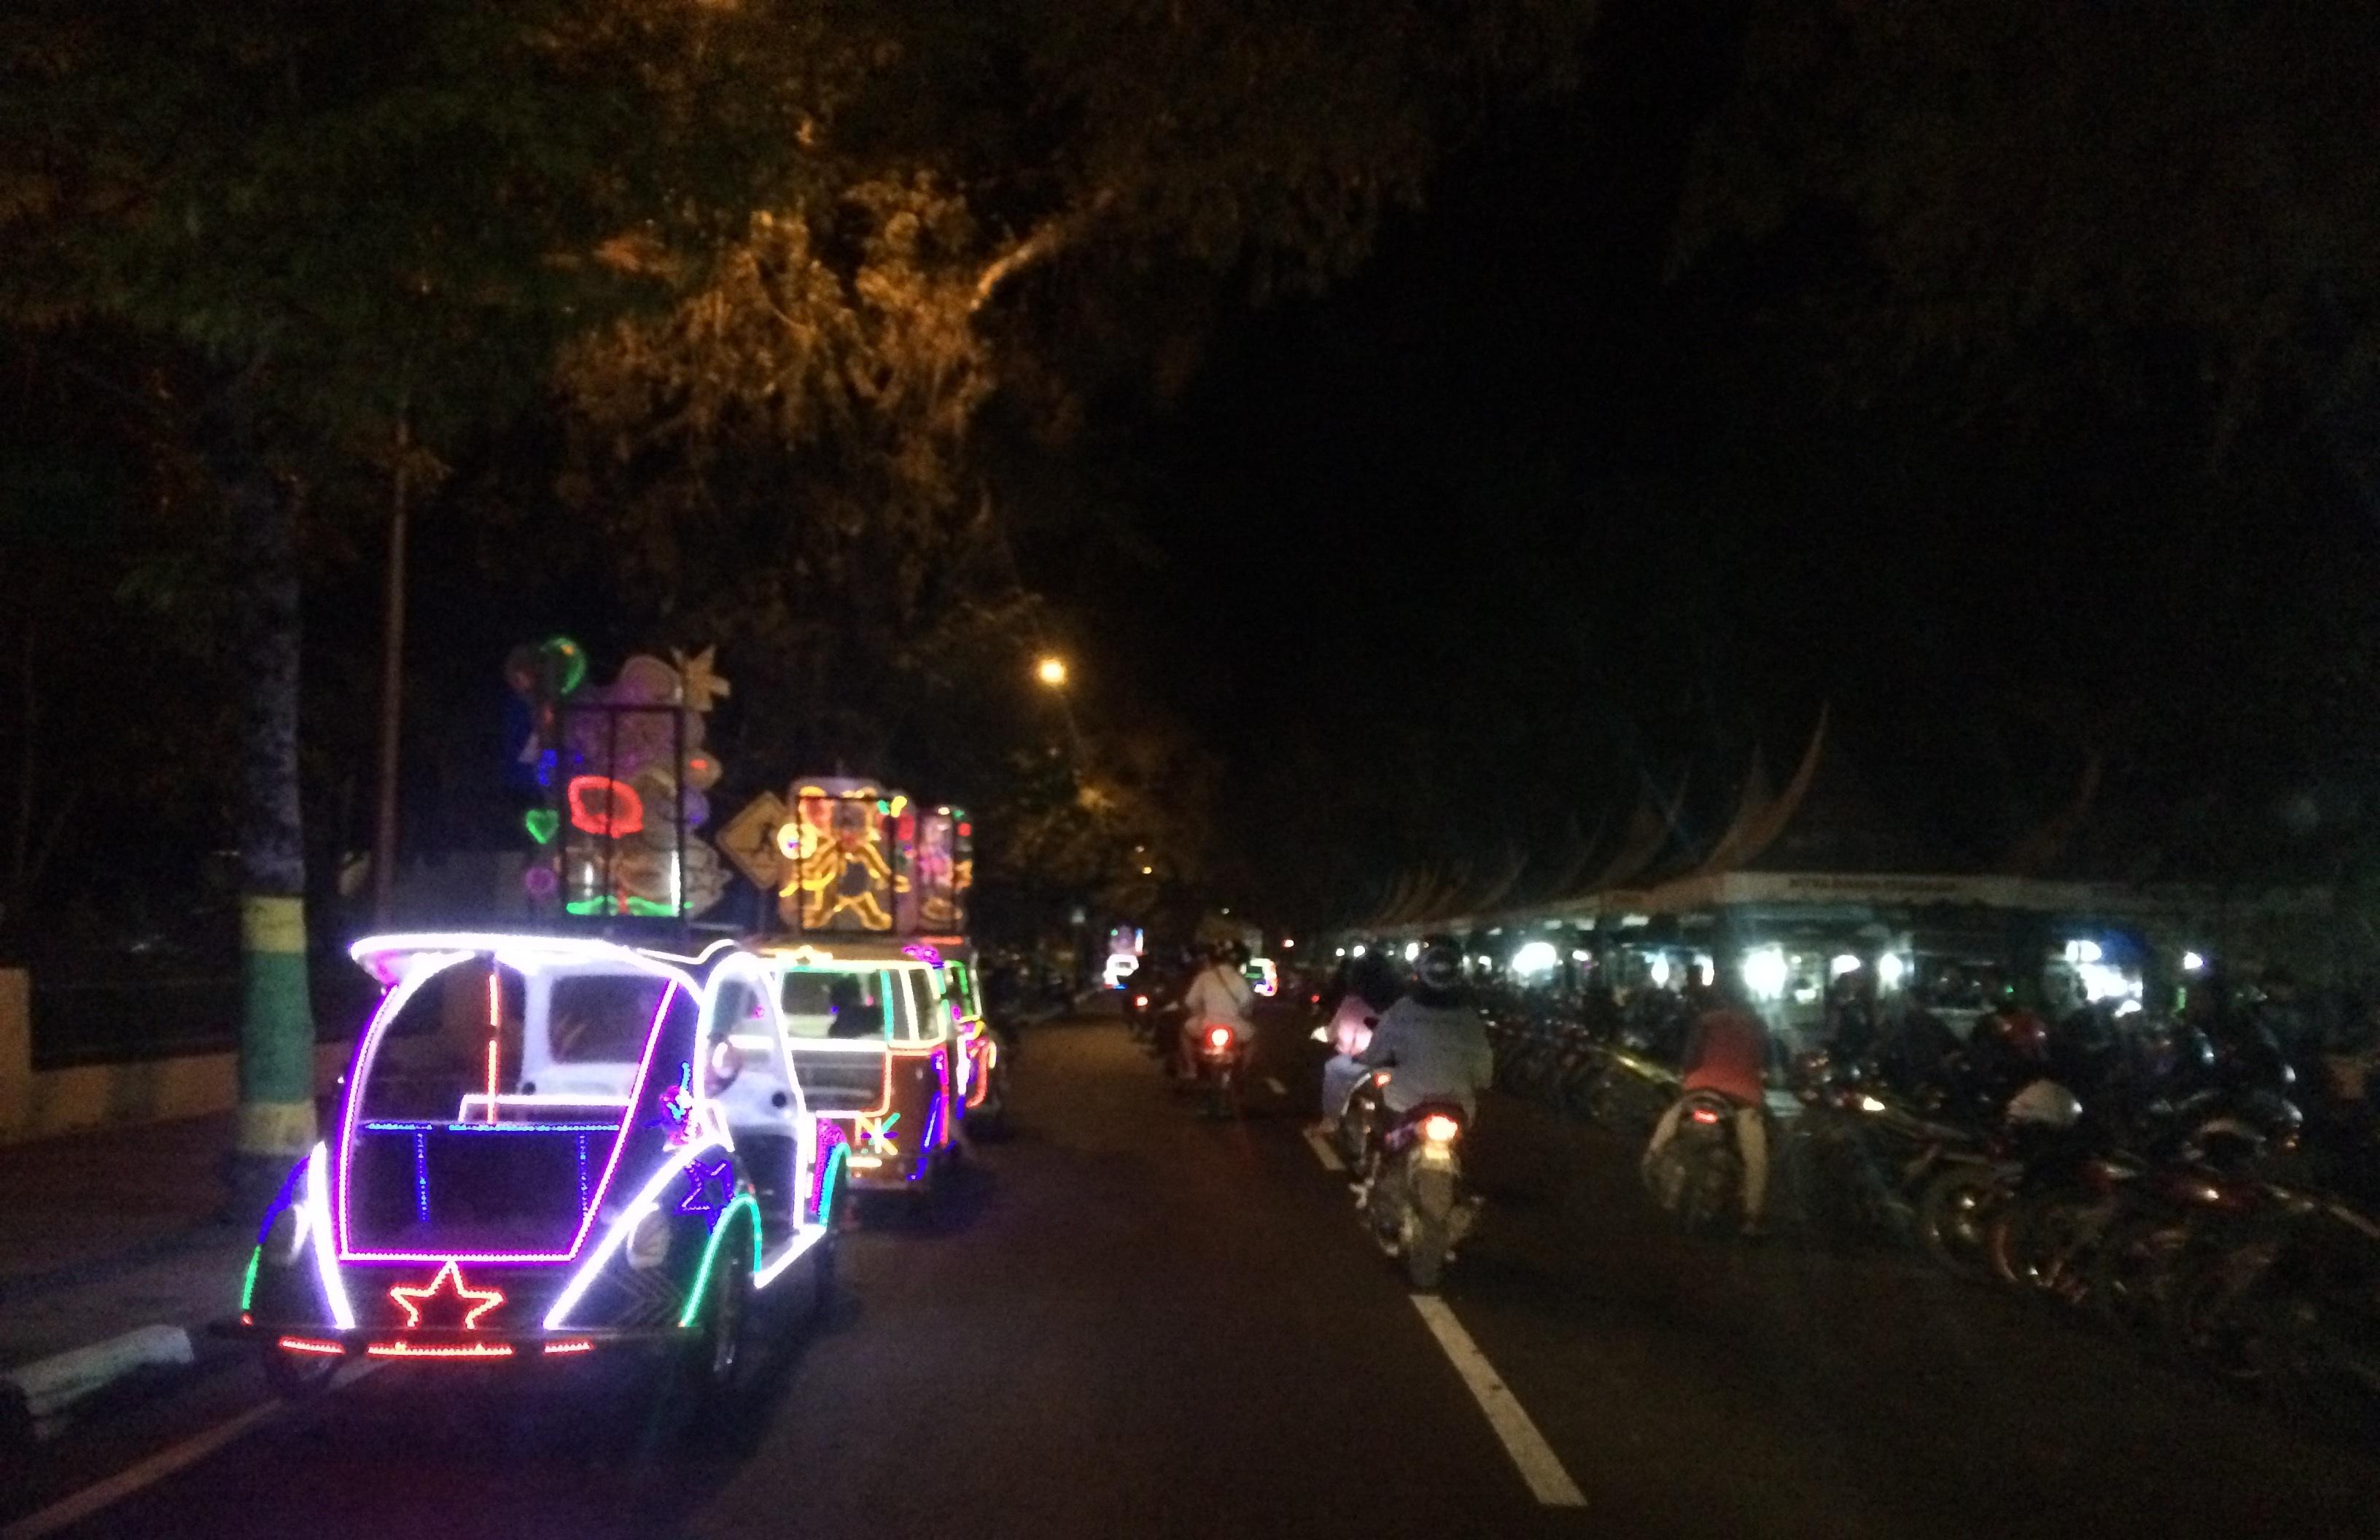 Meretas Rindu di Alun-Alun Wates Kulon Progo